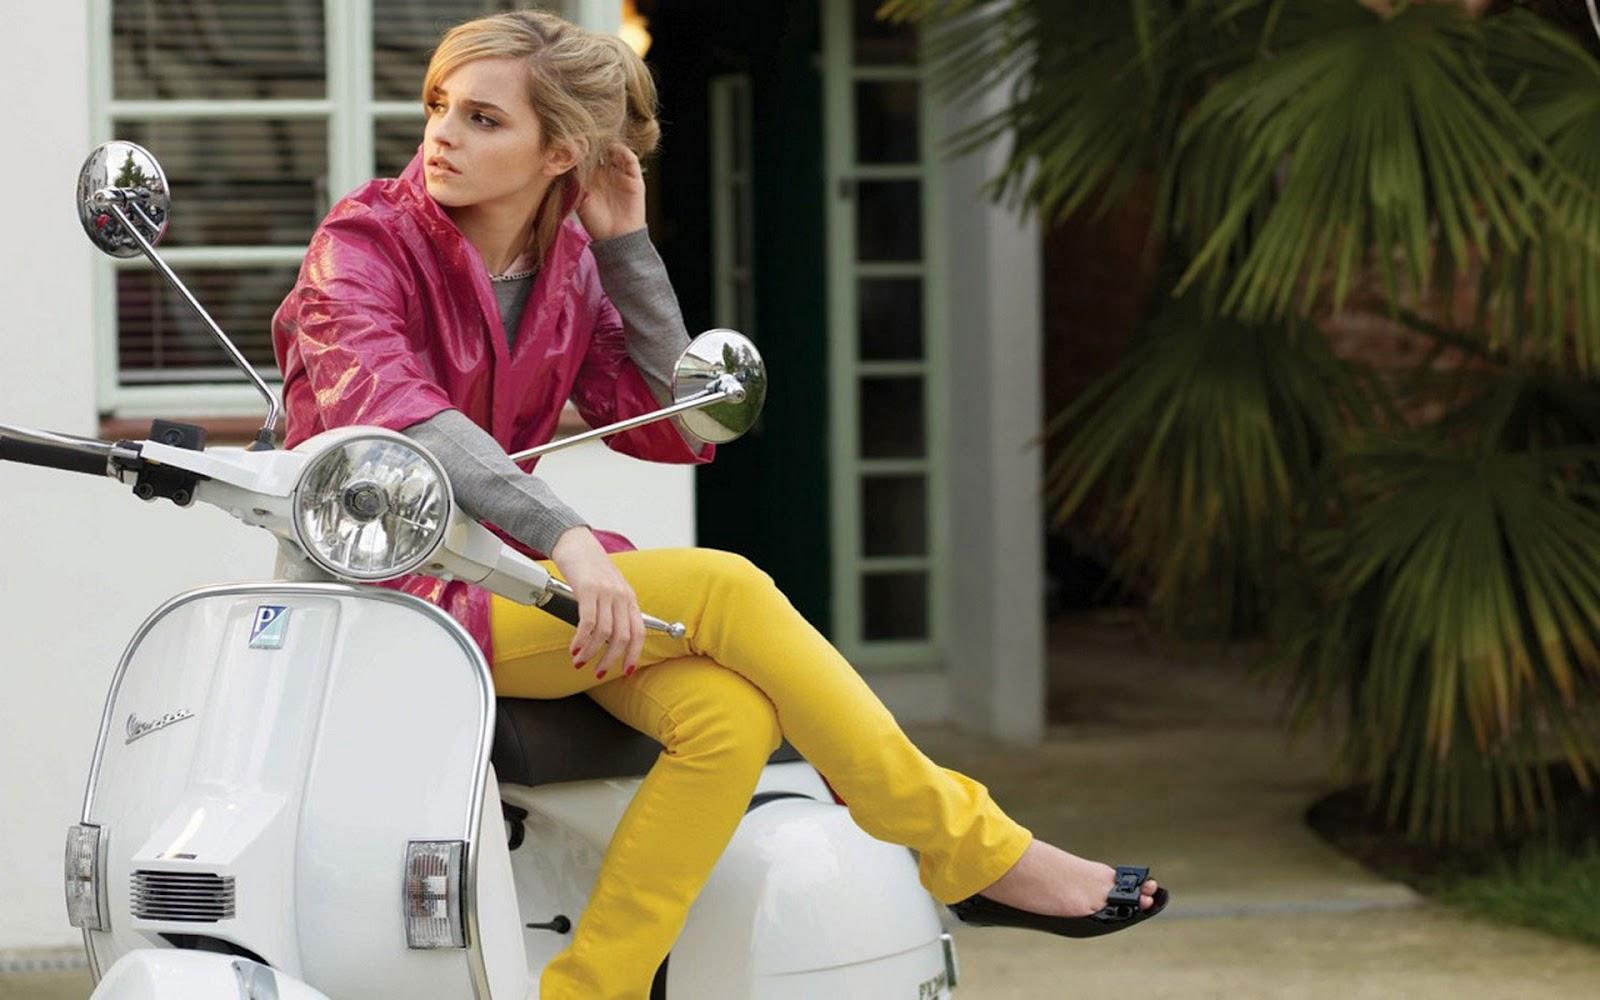 1cd57aa833e2 Ένα καλοκαιρινό και φωτεινό χρώμα που όμως μπορεί να φοριέται εύκολα όλες  τις εποχές!